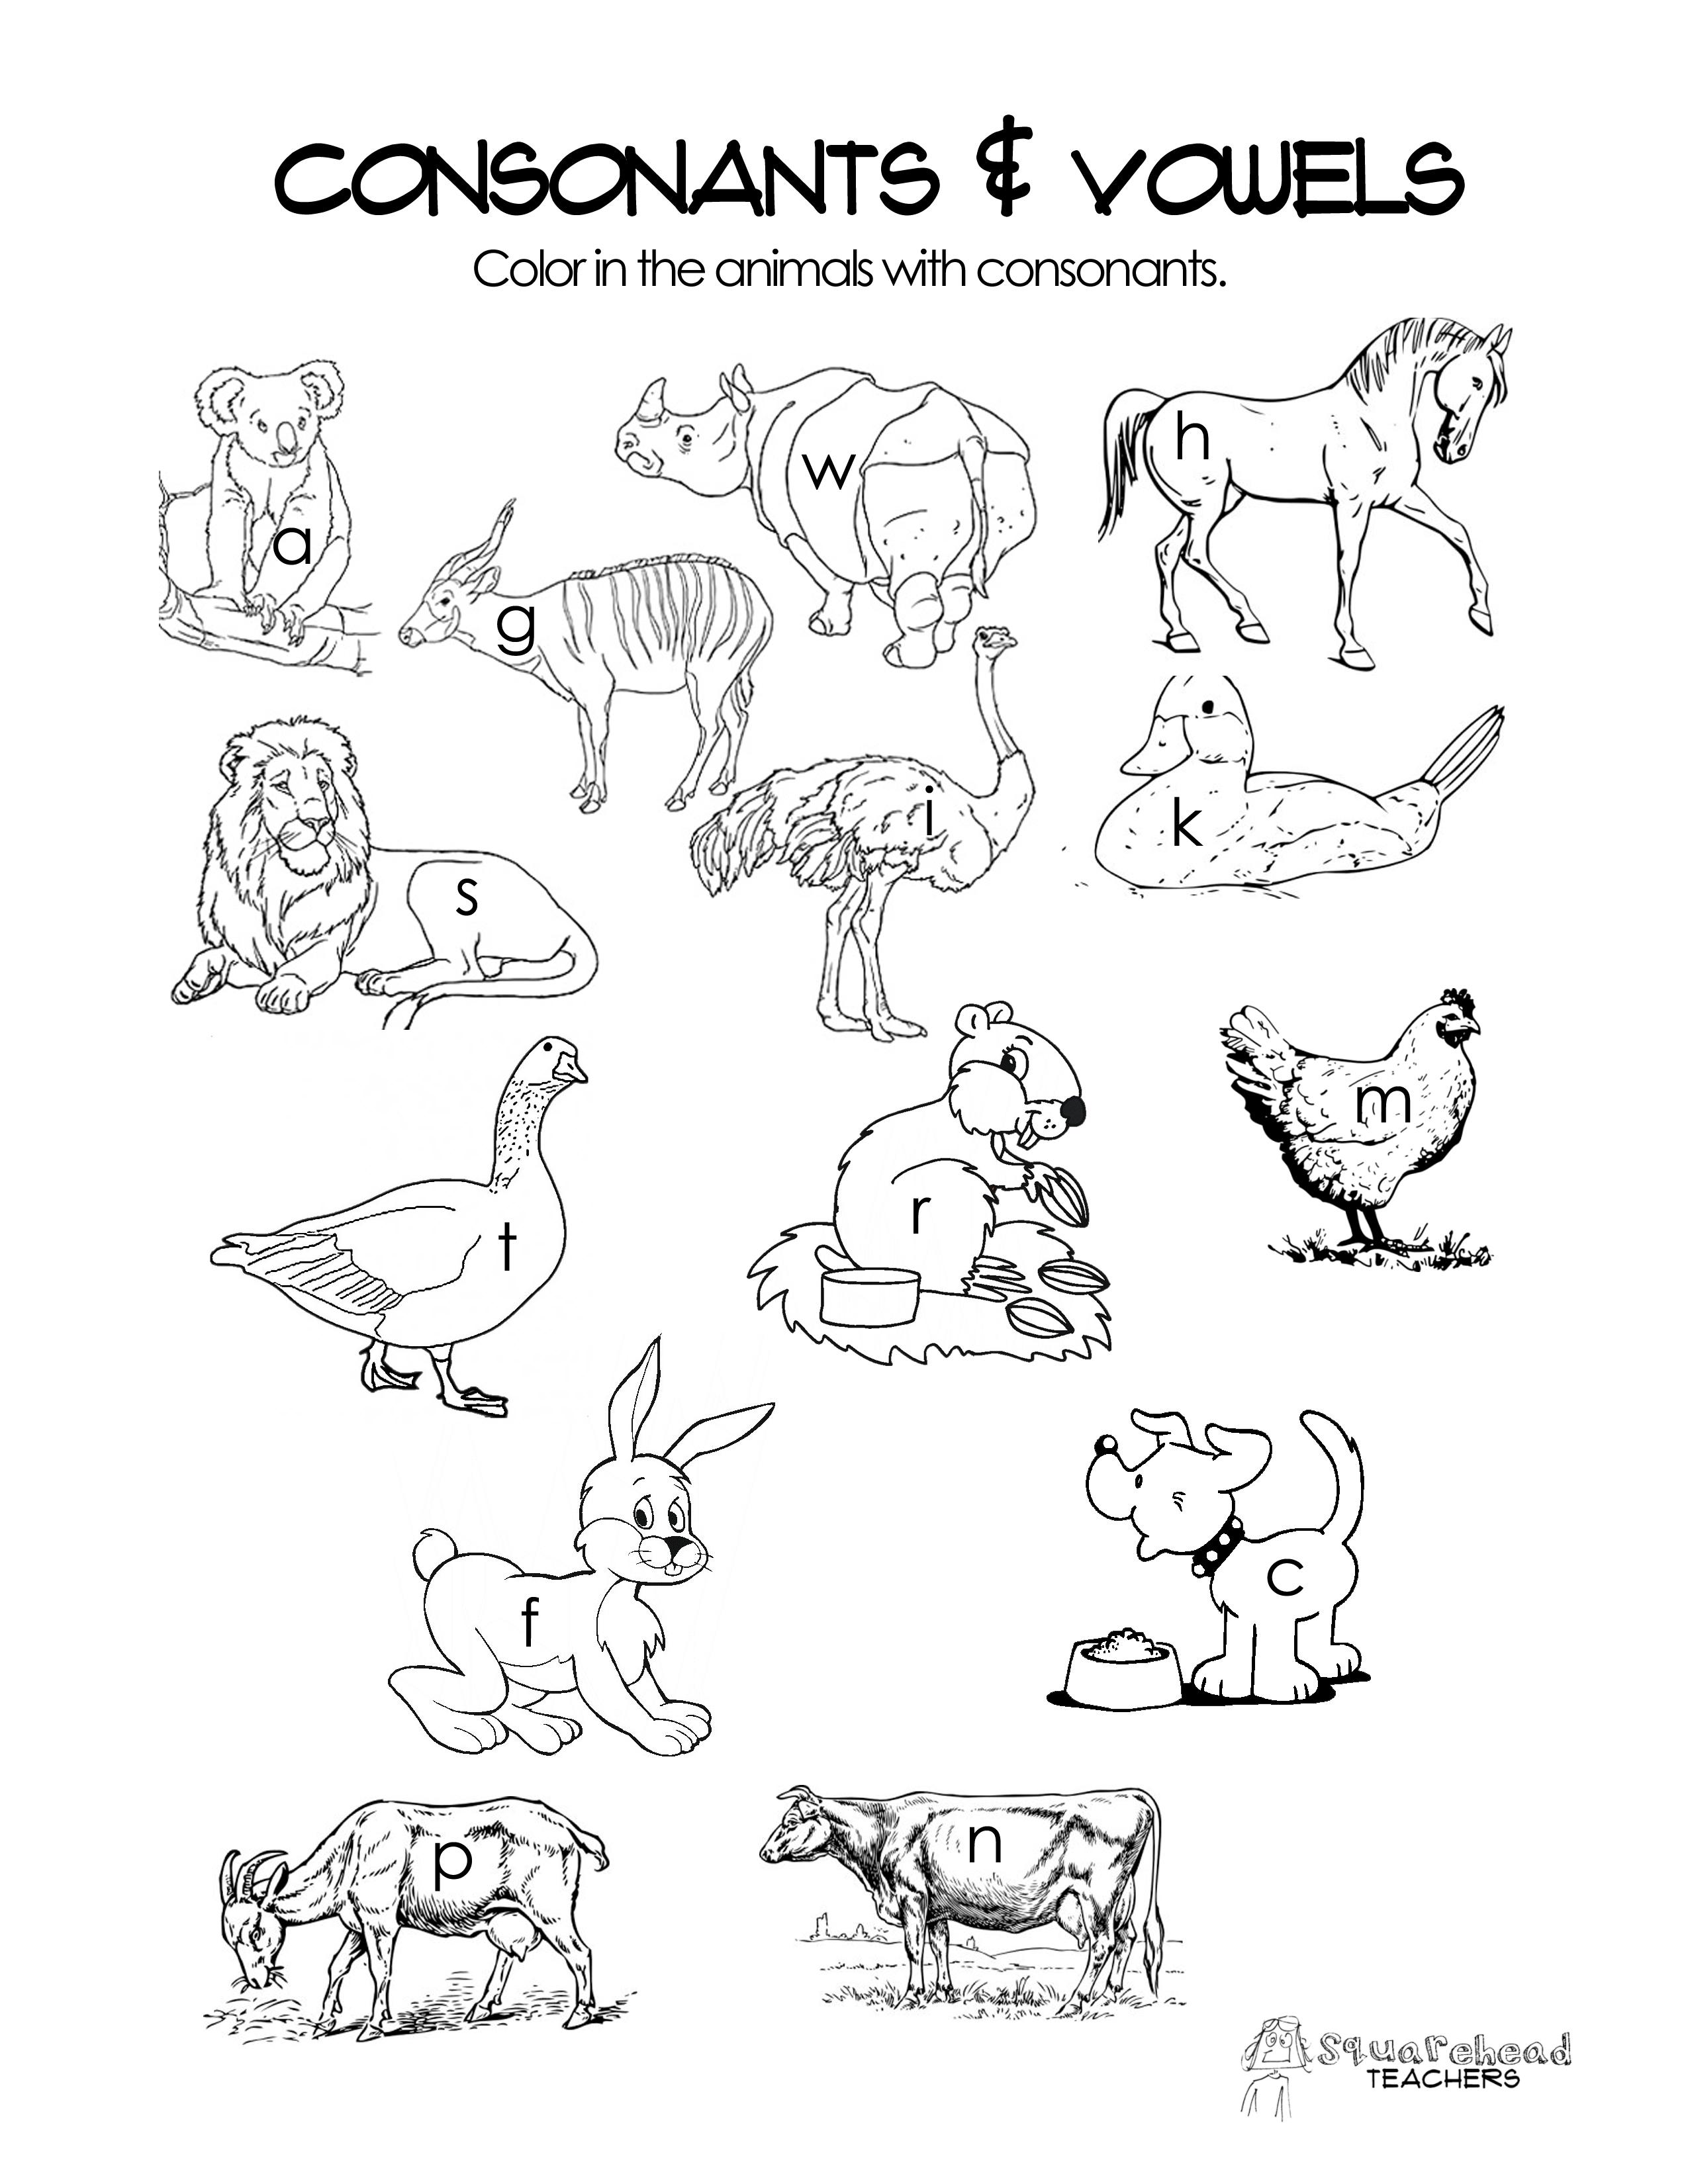 Long vowel coloring sheet - Consonant Vowel Consonant Worksheets Sharebrowse Download Image Long Vowel Coloring